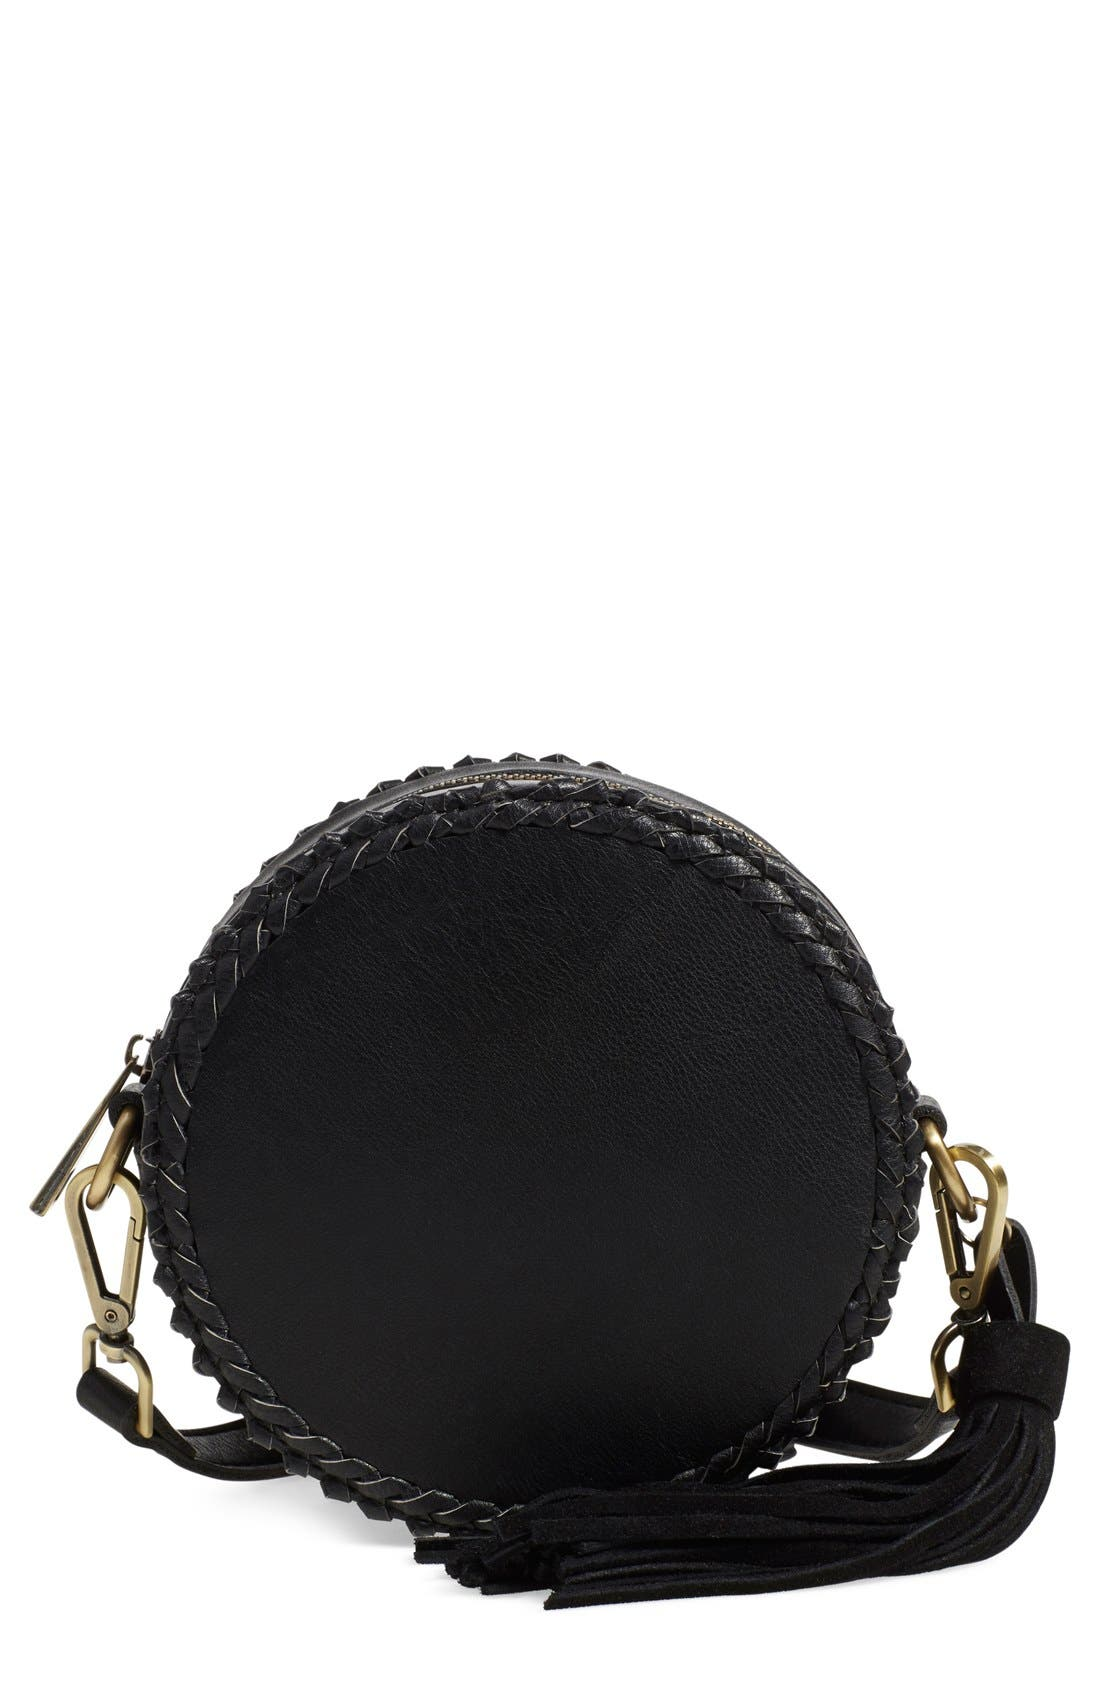 Main Image - Street Level Round Crossbody Bag